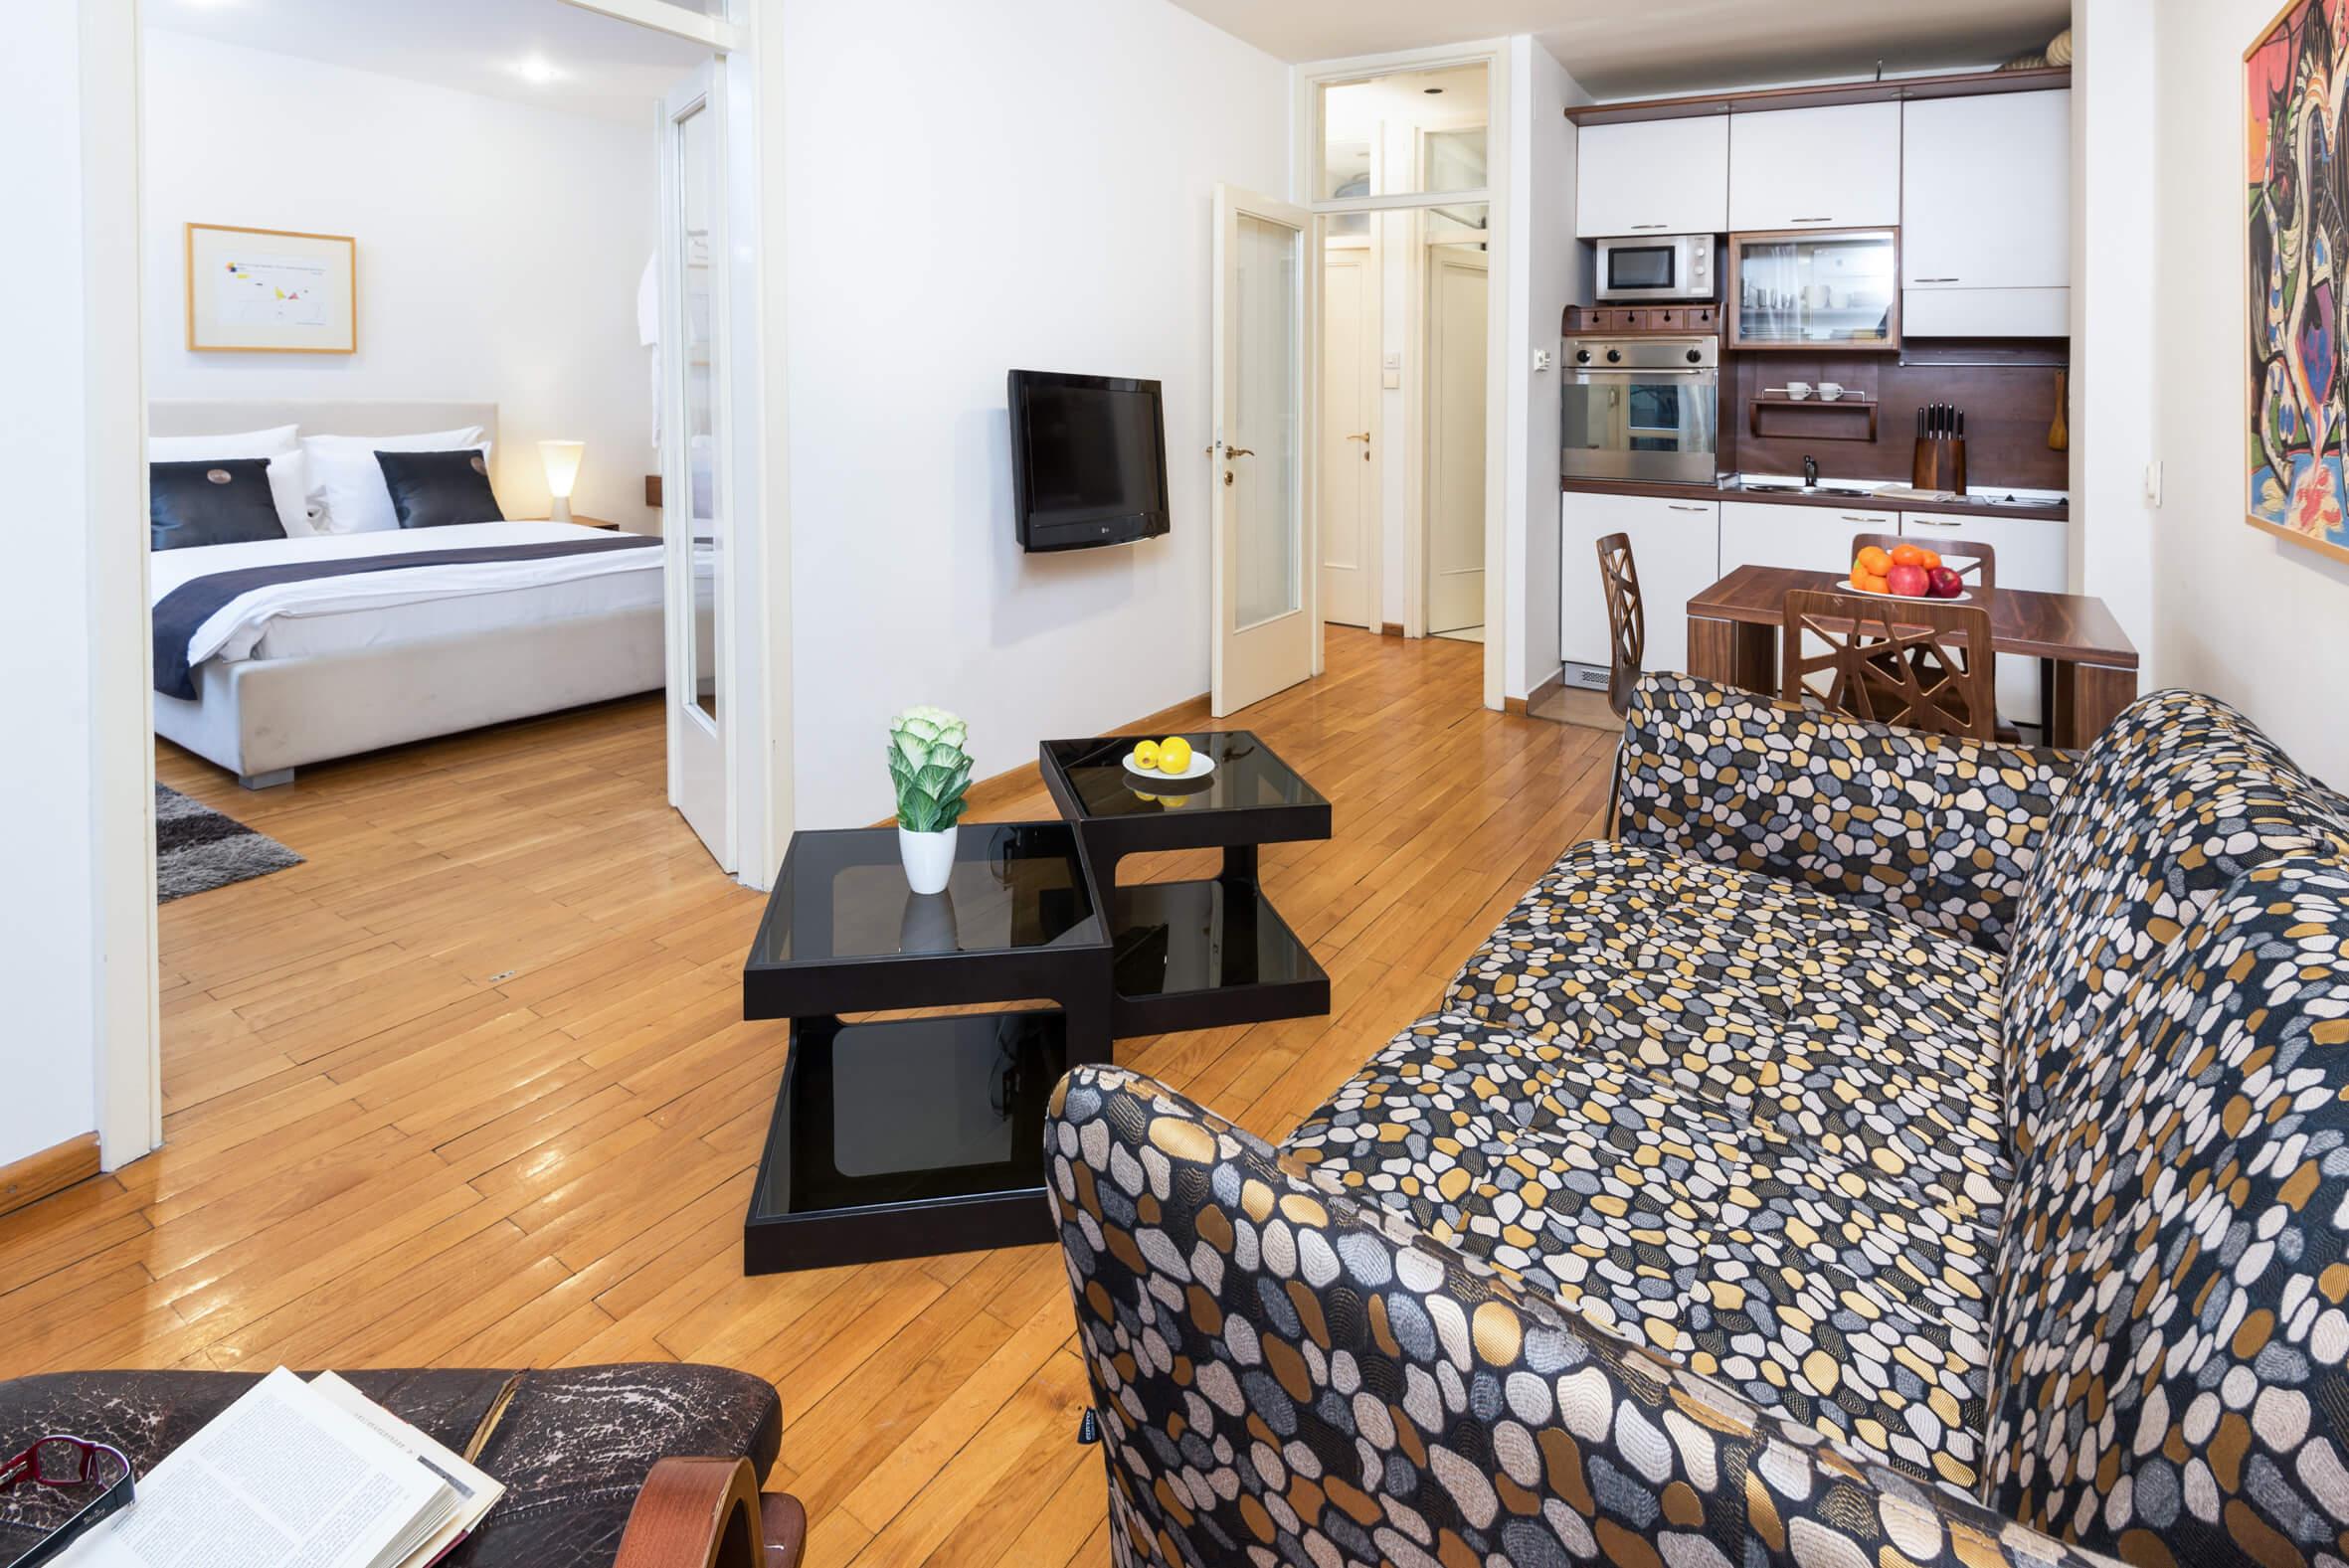 Apartmani Beograd | Stan na dan Beograd centar | Apartman A25 - Pogled na spavaću sobu